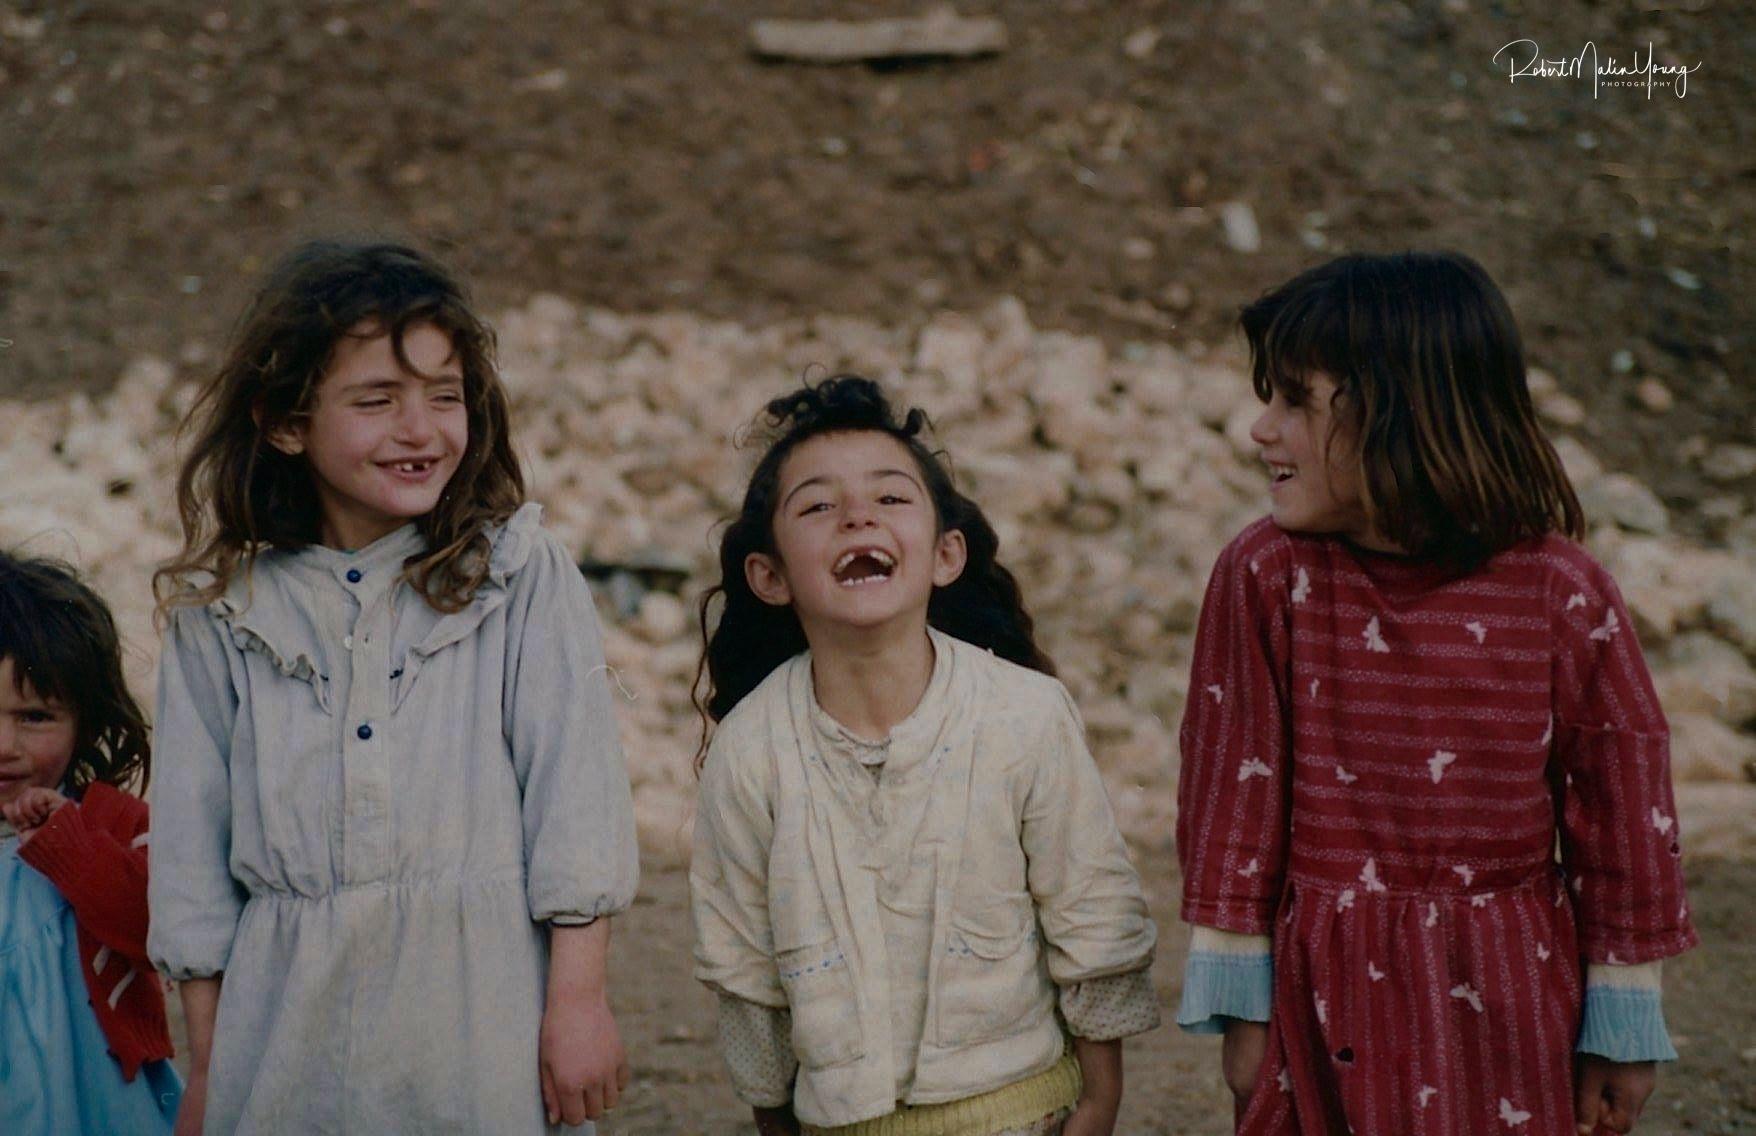 Kurdish children and Kurdistan, Iraq1992 by Robert Malin Young